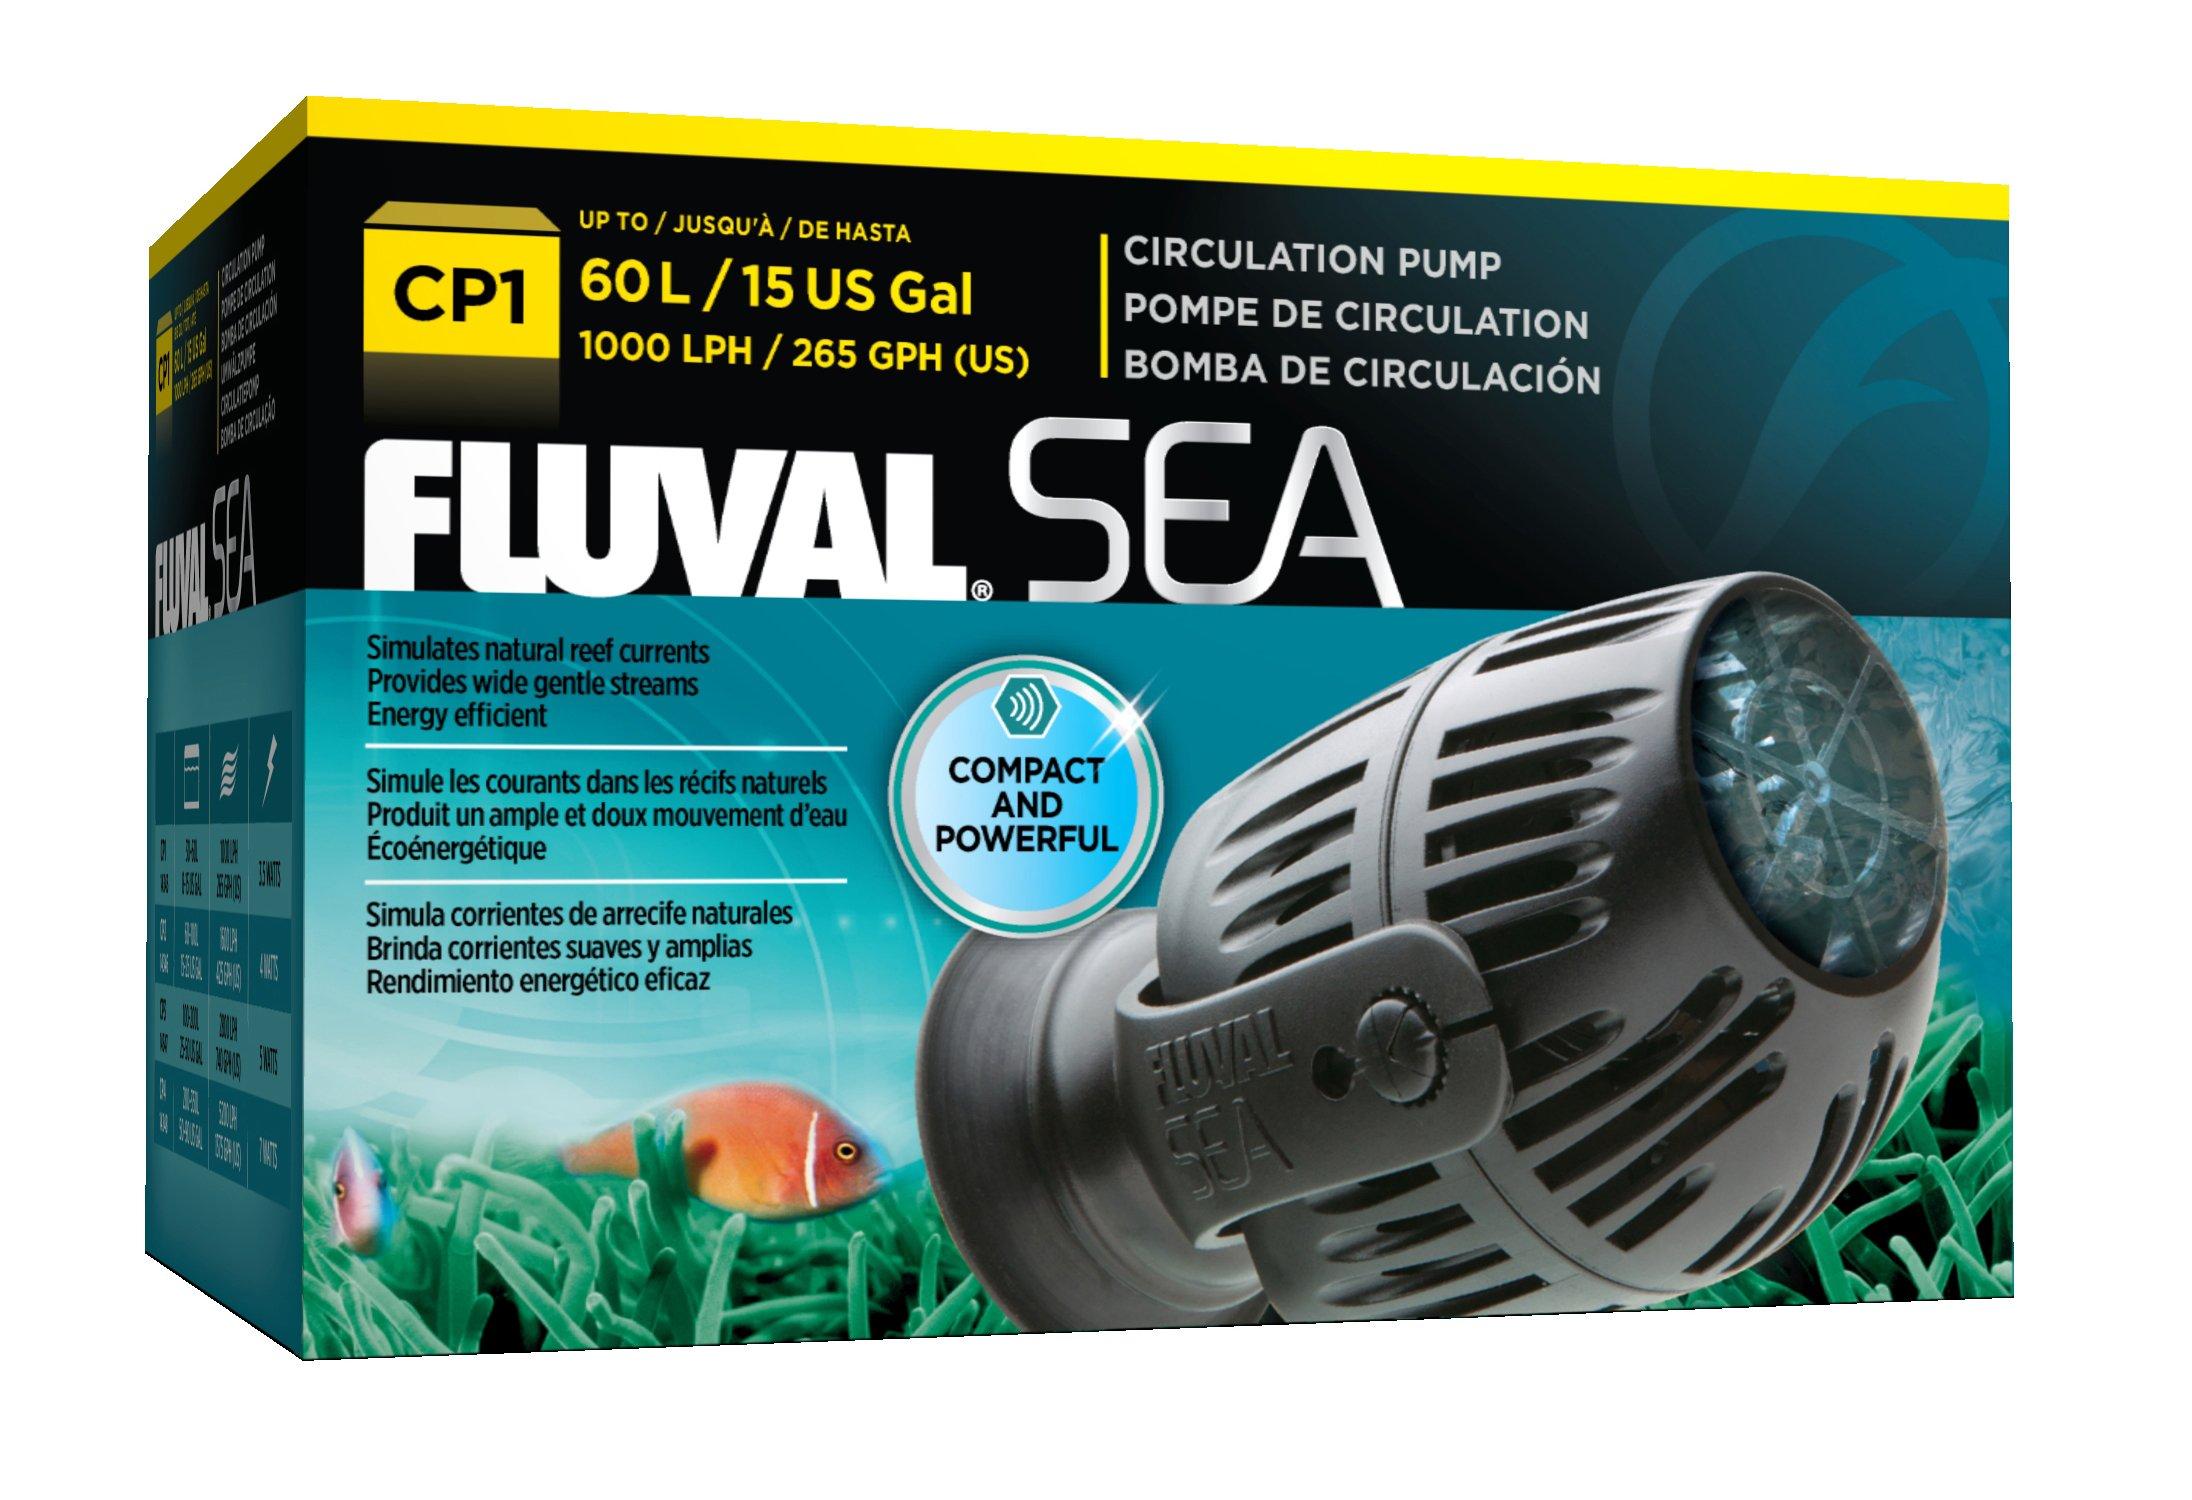 Fluval Sea CP1 Circulation Pump for Aquarium by Fluval